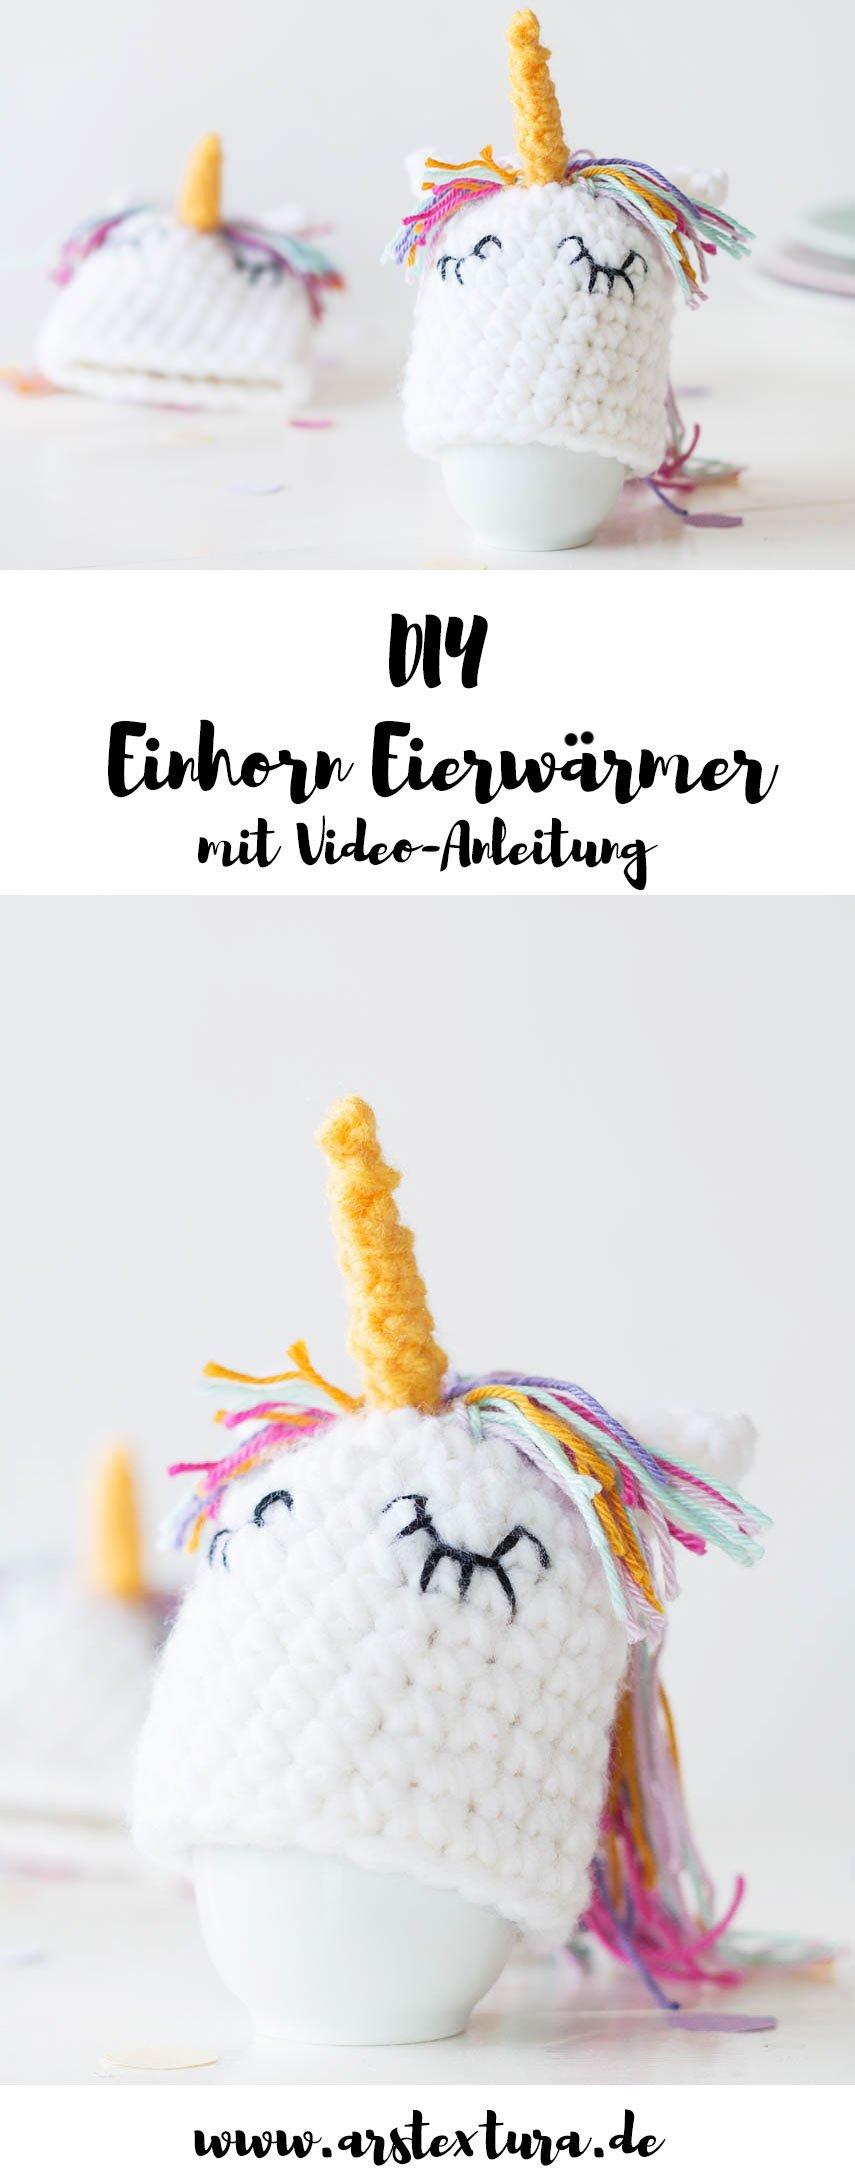 Anleitung Einhorn Eierwärmer Häkeln Ars Textura Diy Blog